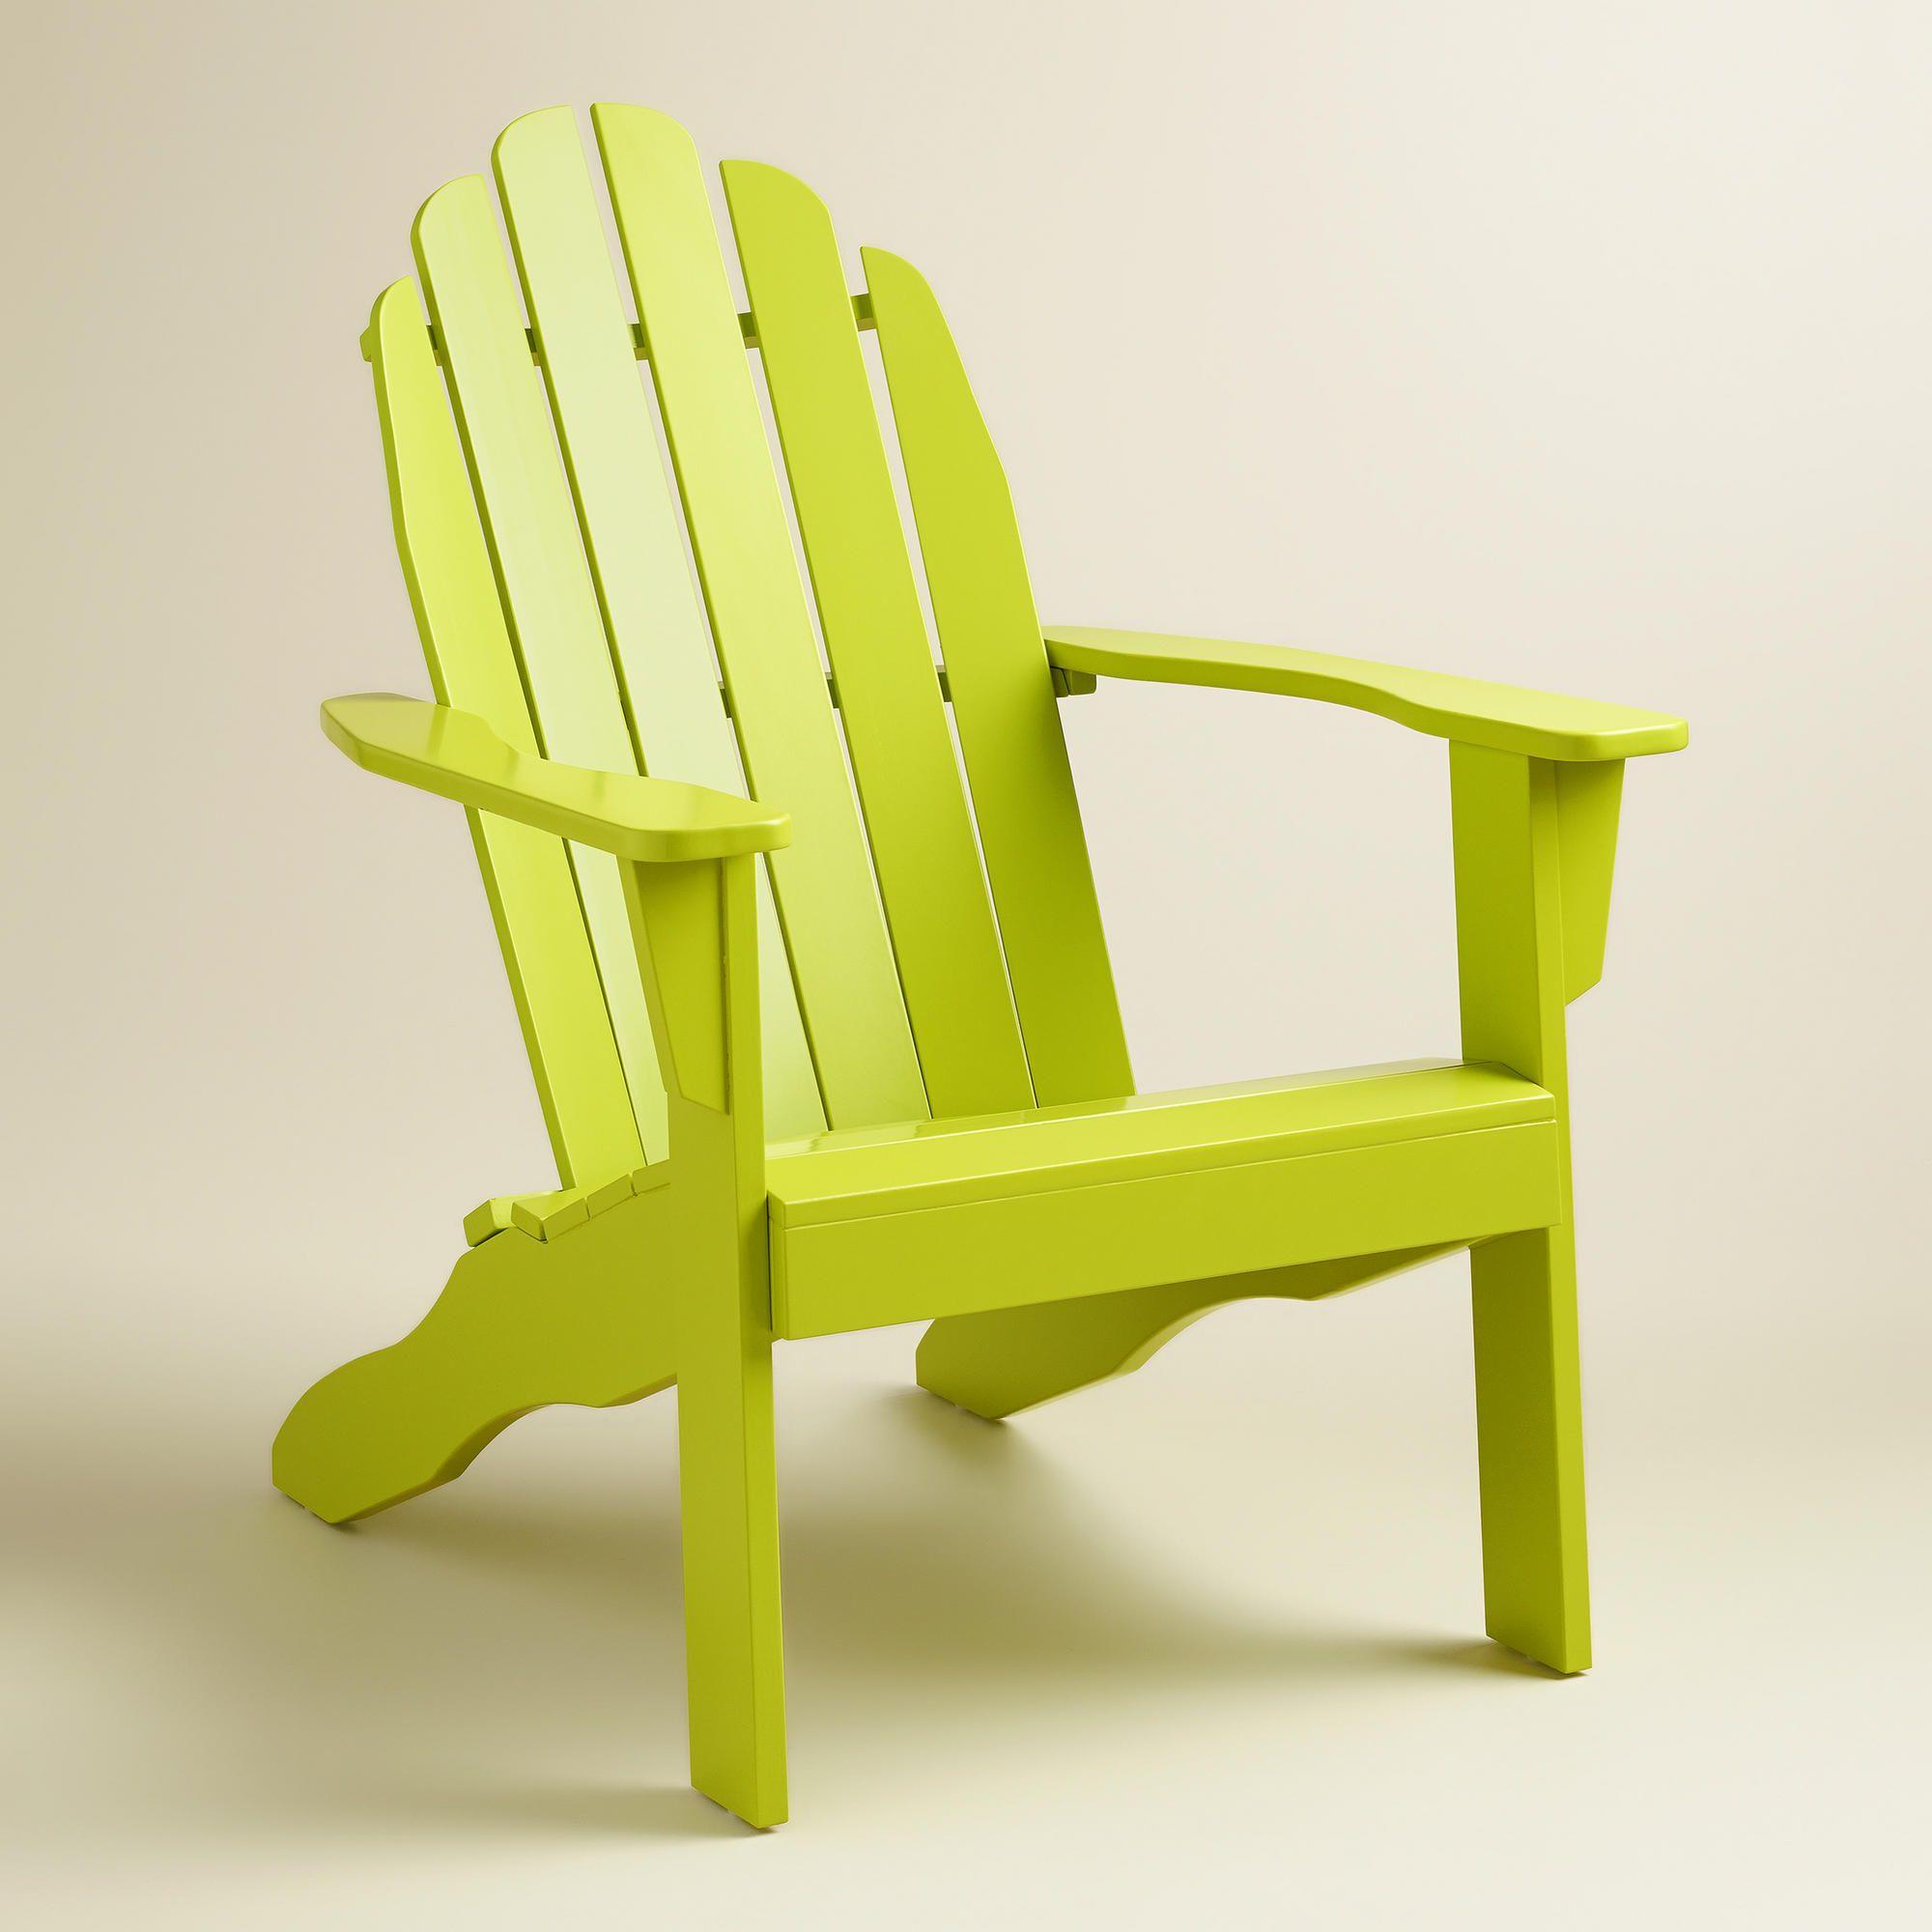 Apple Green Adirondack Chair World Market Green Adirondack